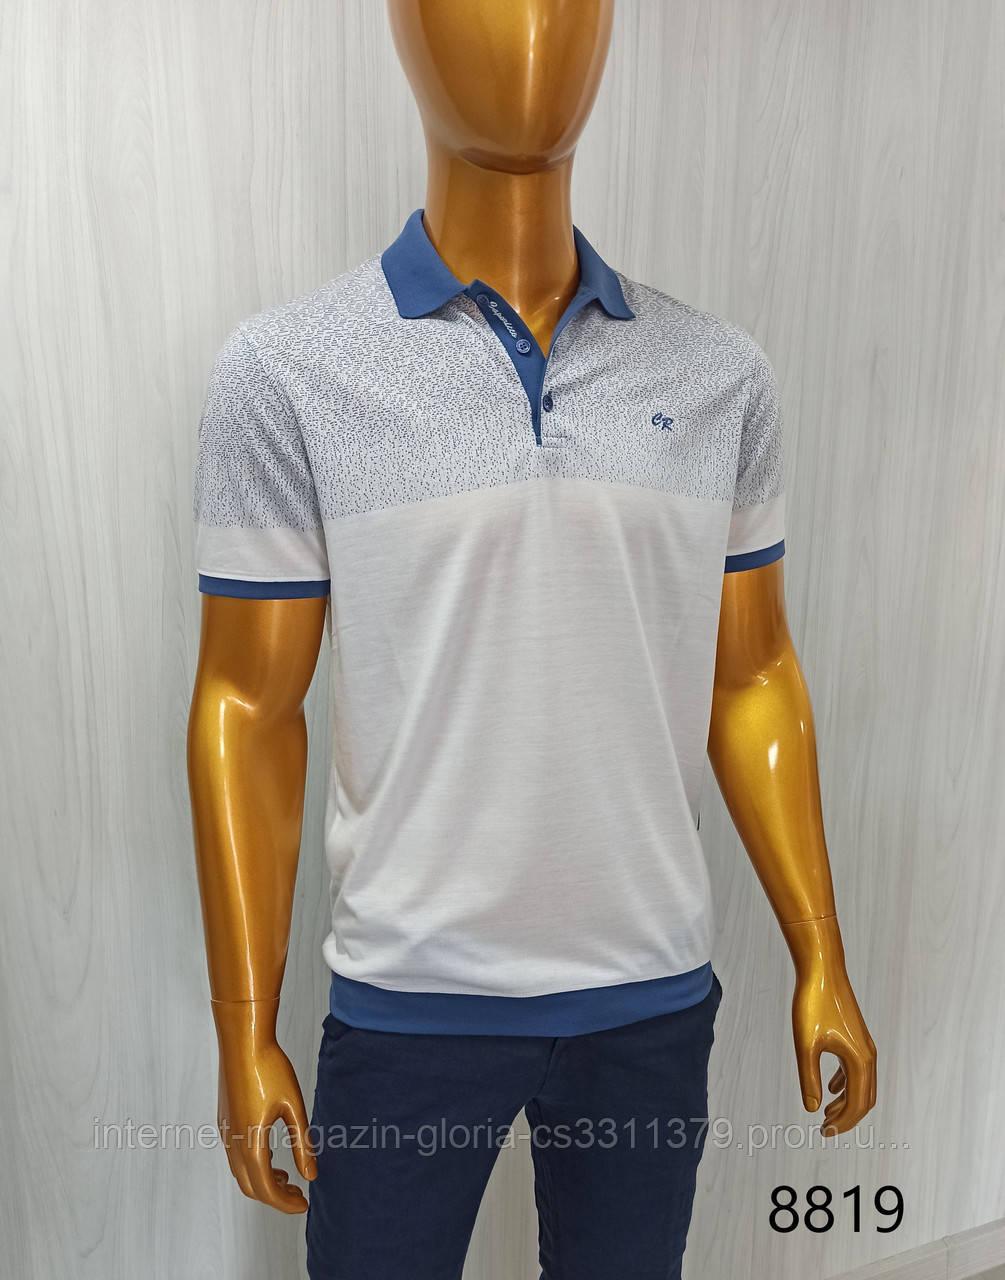 Мужская футболка поло Caporicco. PSL-8819. Размеры: Батал 2XL(2),3XL,4XL/